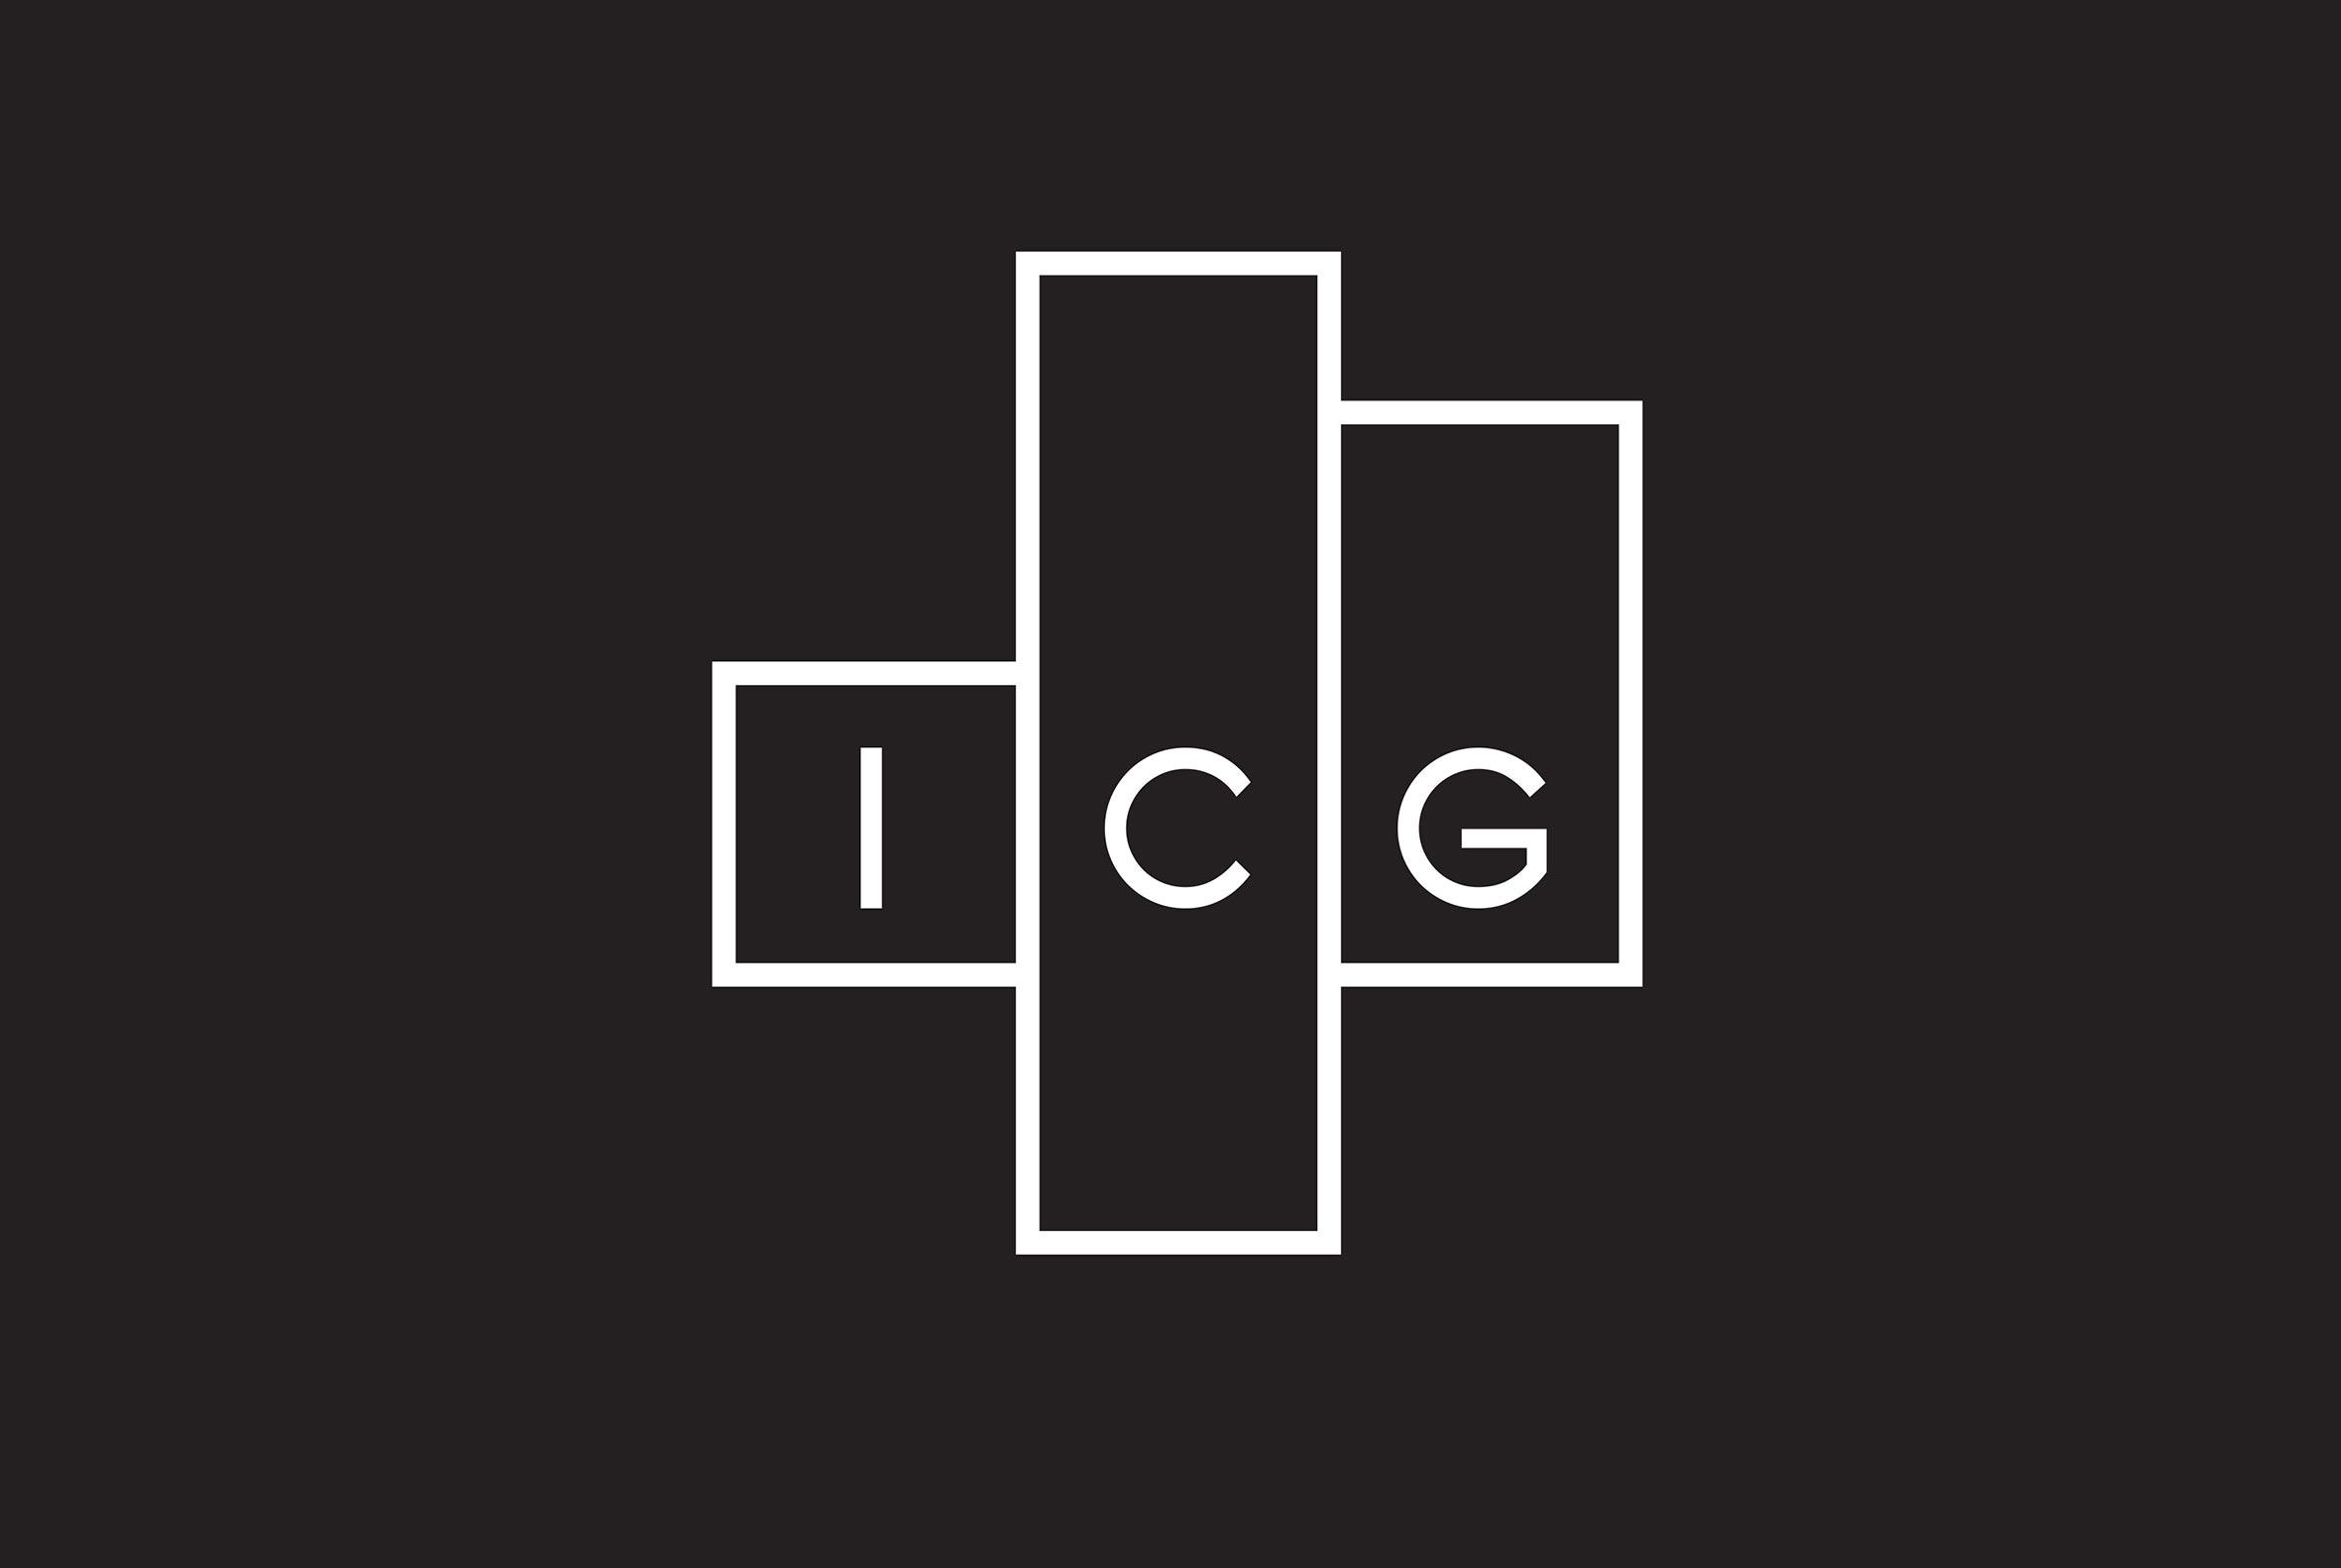 ICG brand mark